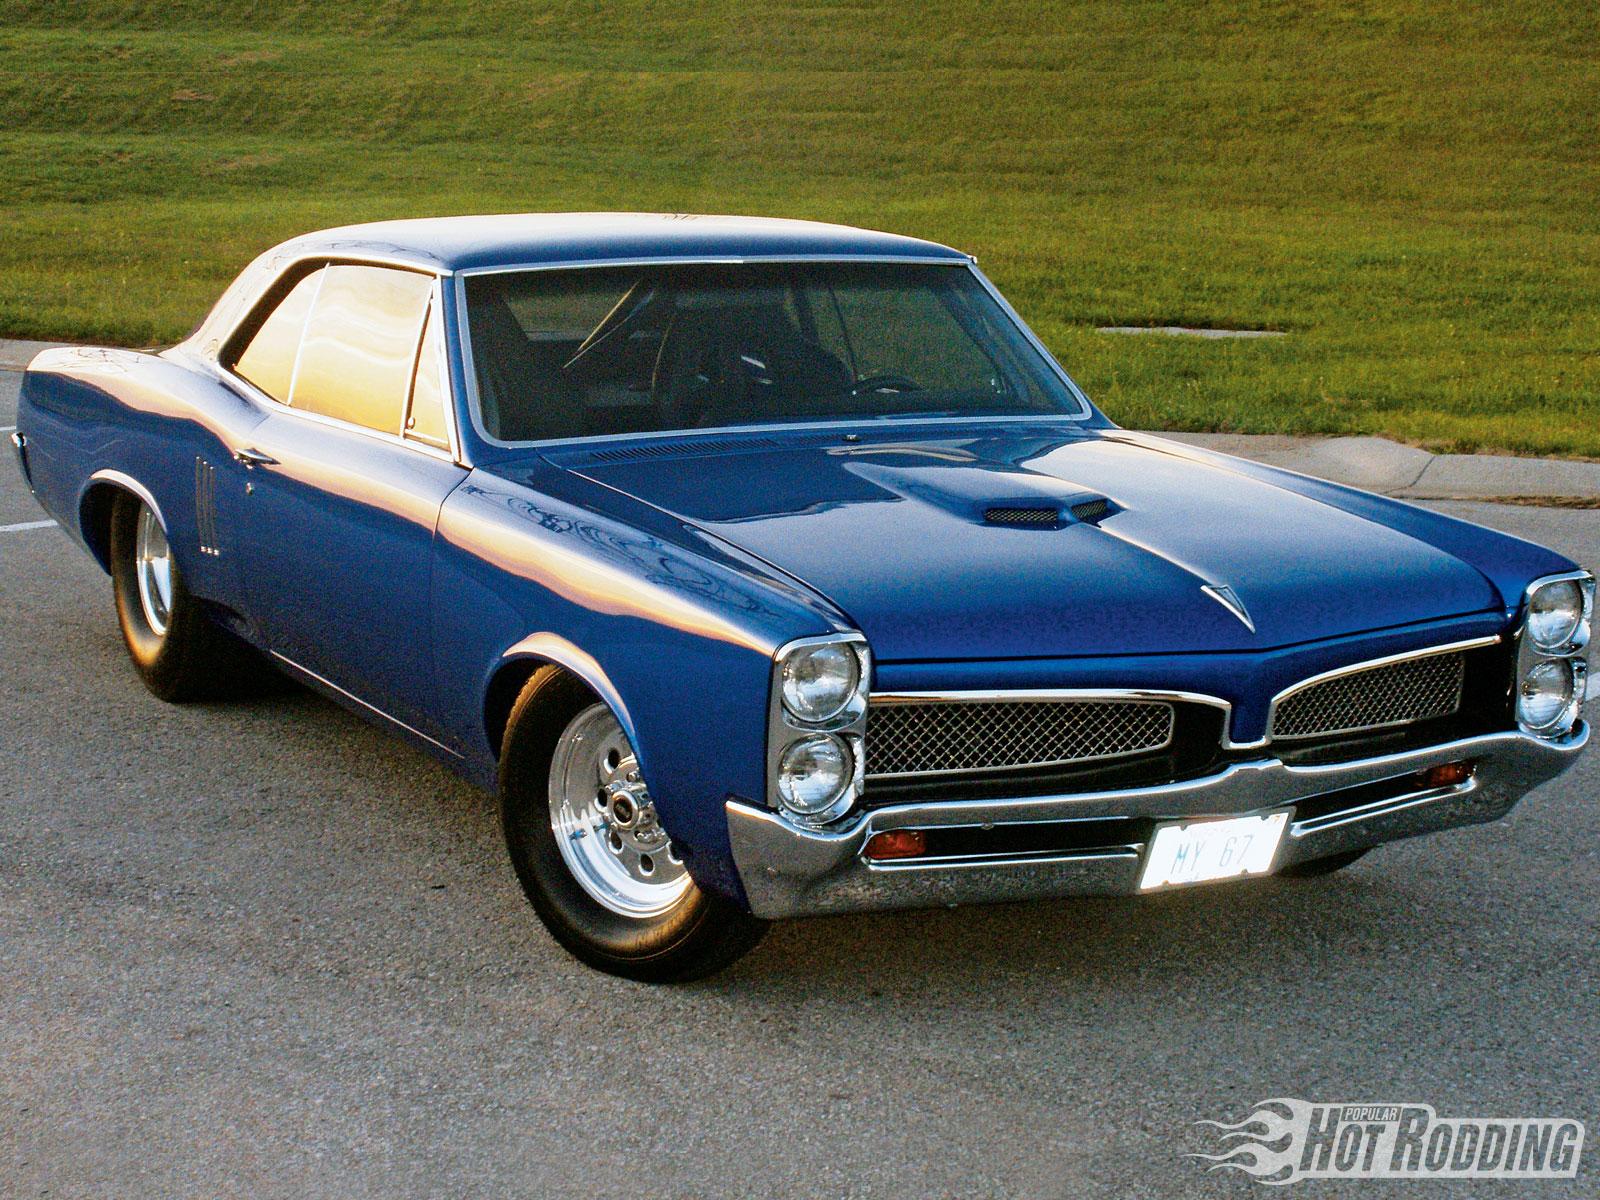 1967 Pontiac Gto Body Rebuild 67 Gto Wallpaper PicsWallpapercom 1600x1200